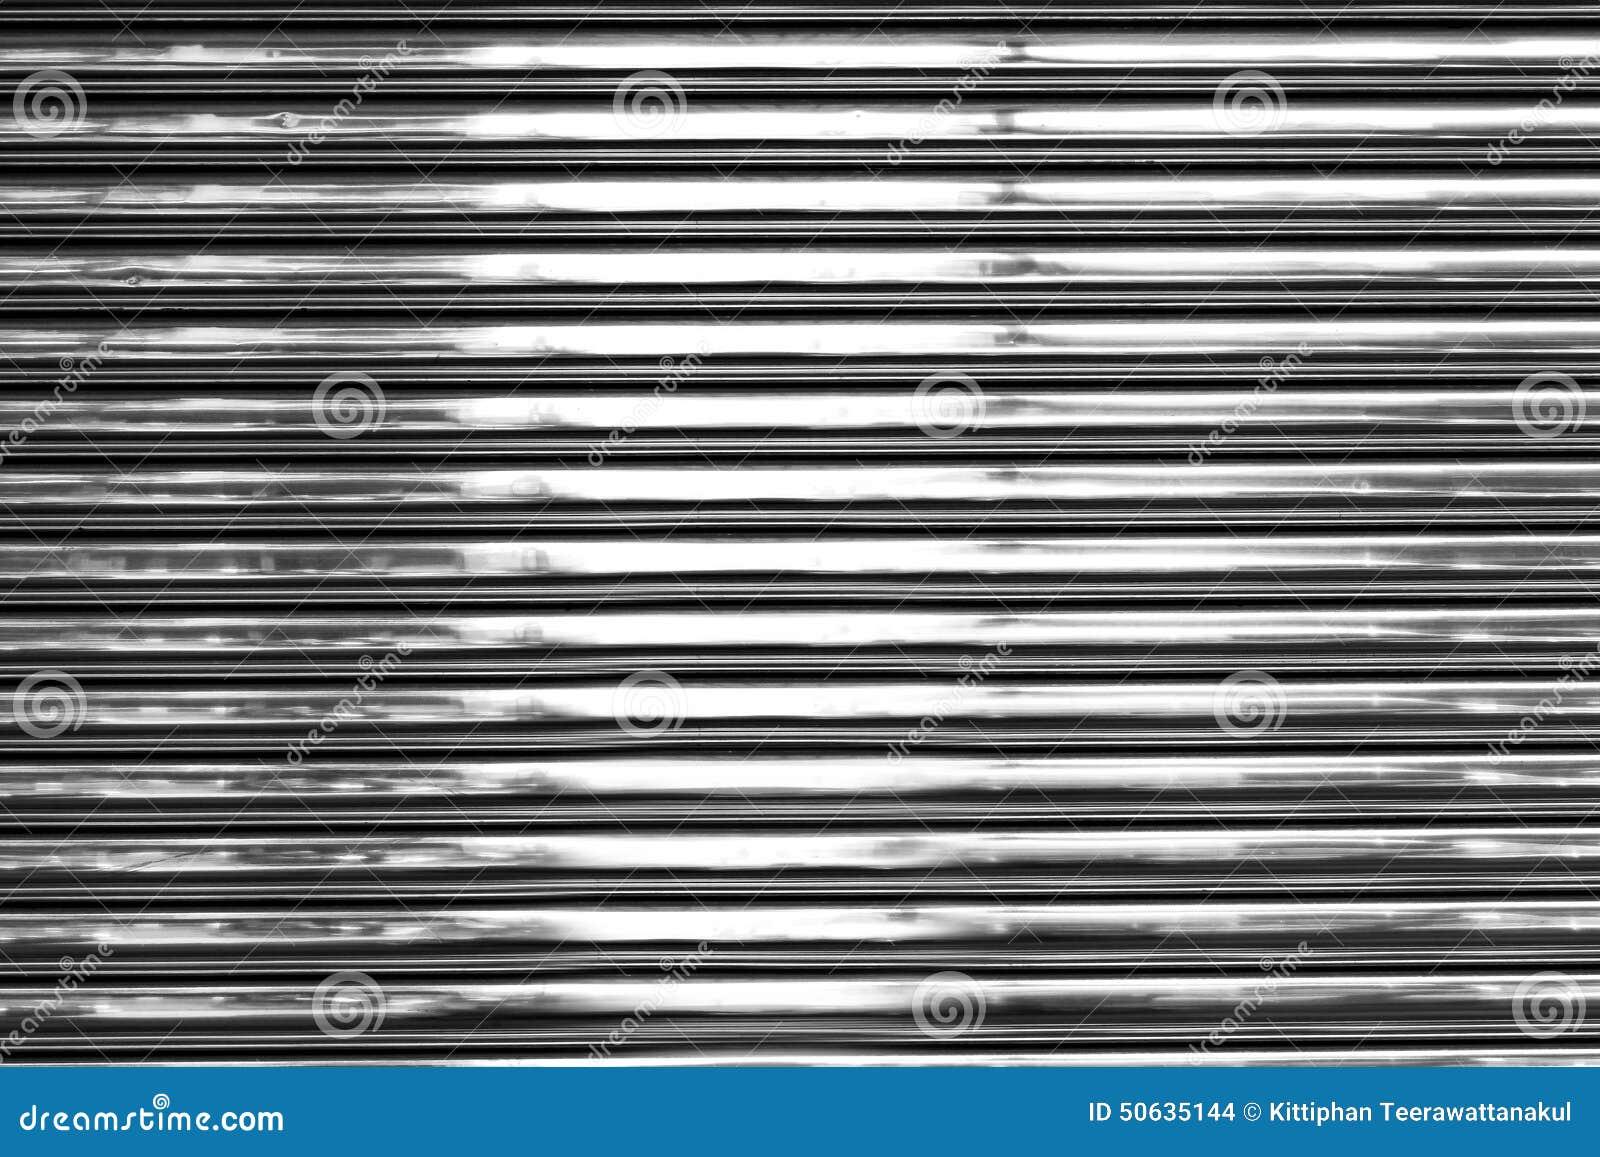 Shiny Metal Wall Stock Photo Image Of Wall Material